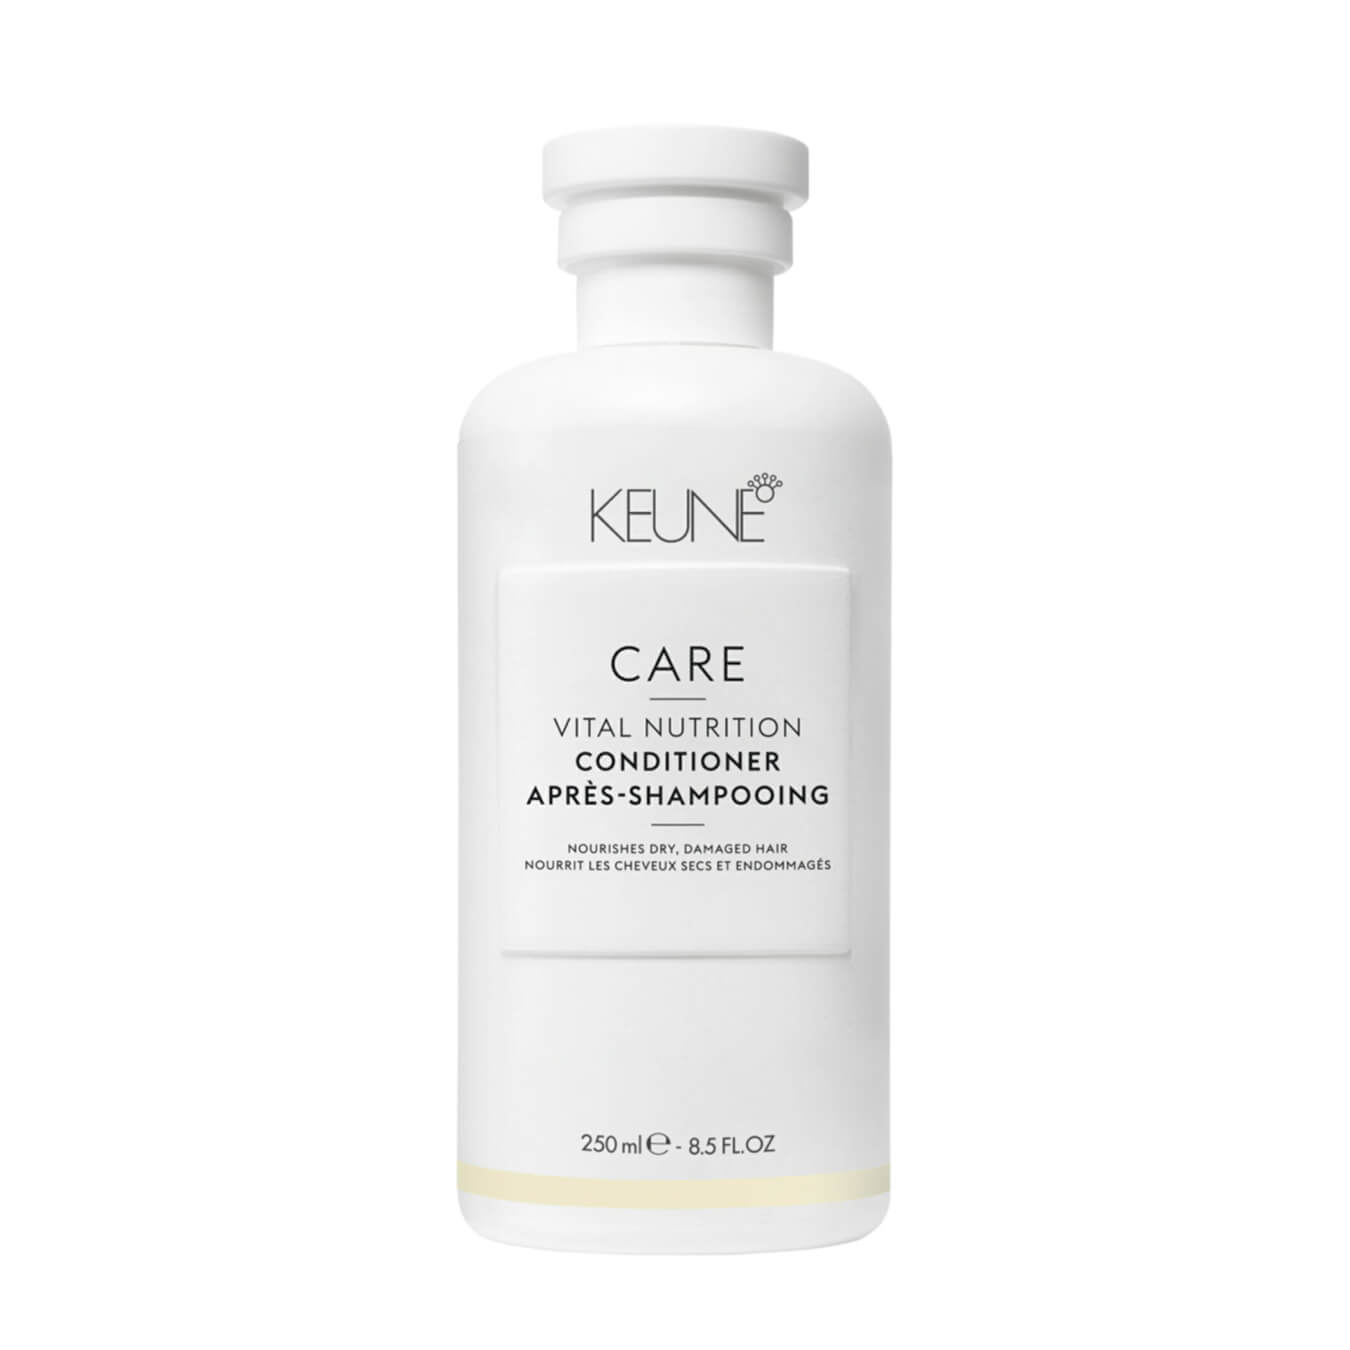 Kauf Keune Care Vital Nutrition Conditioner 250ml